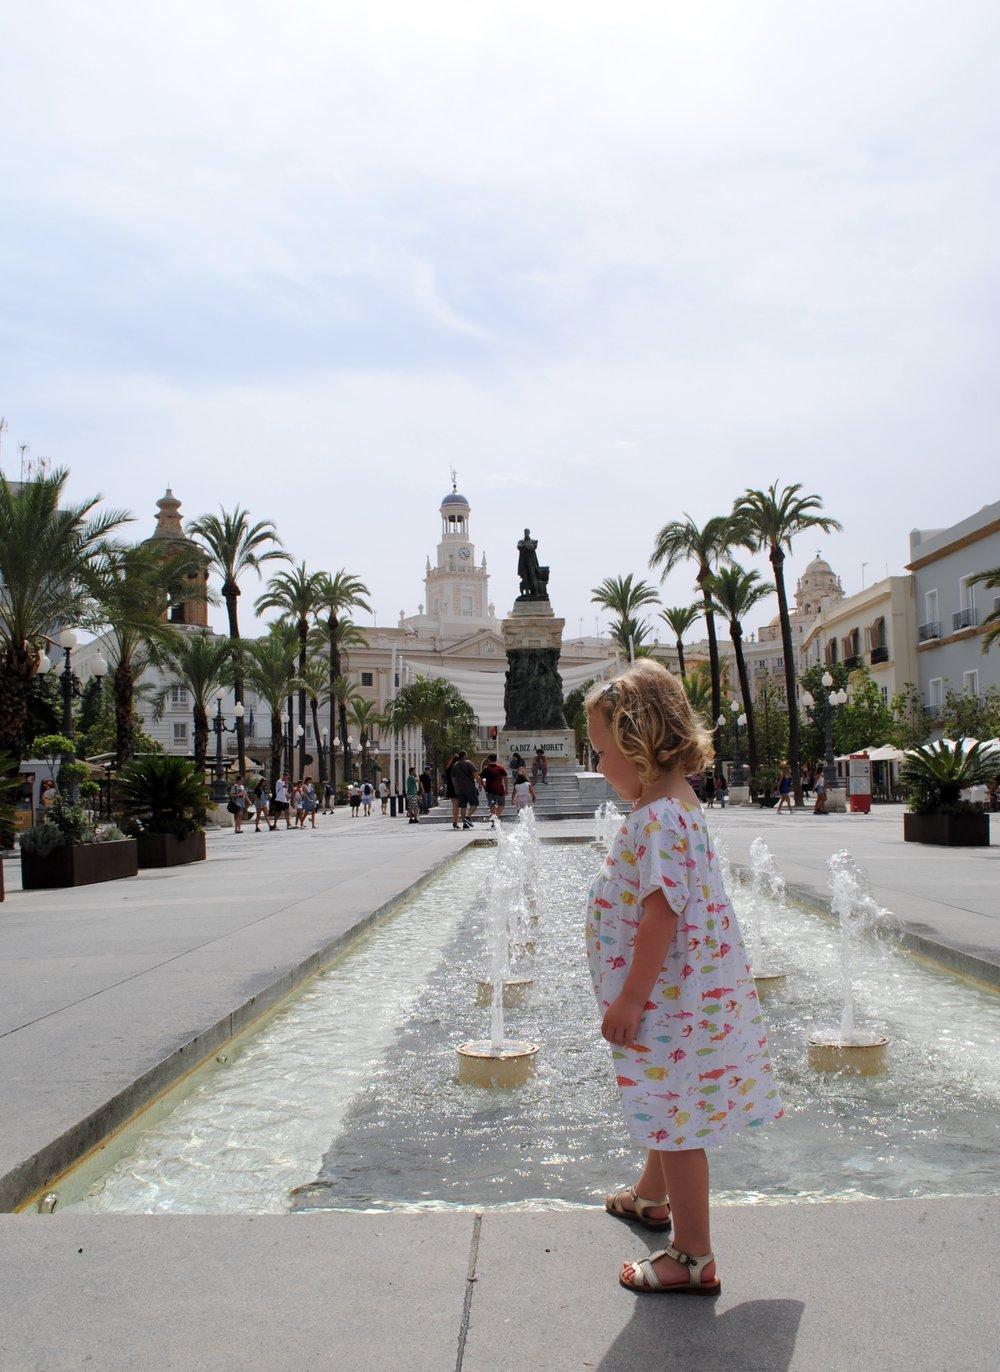 The beautiful city centre of Cádiz.